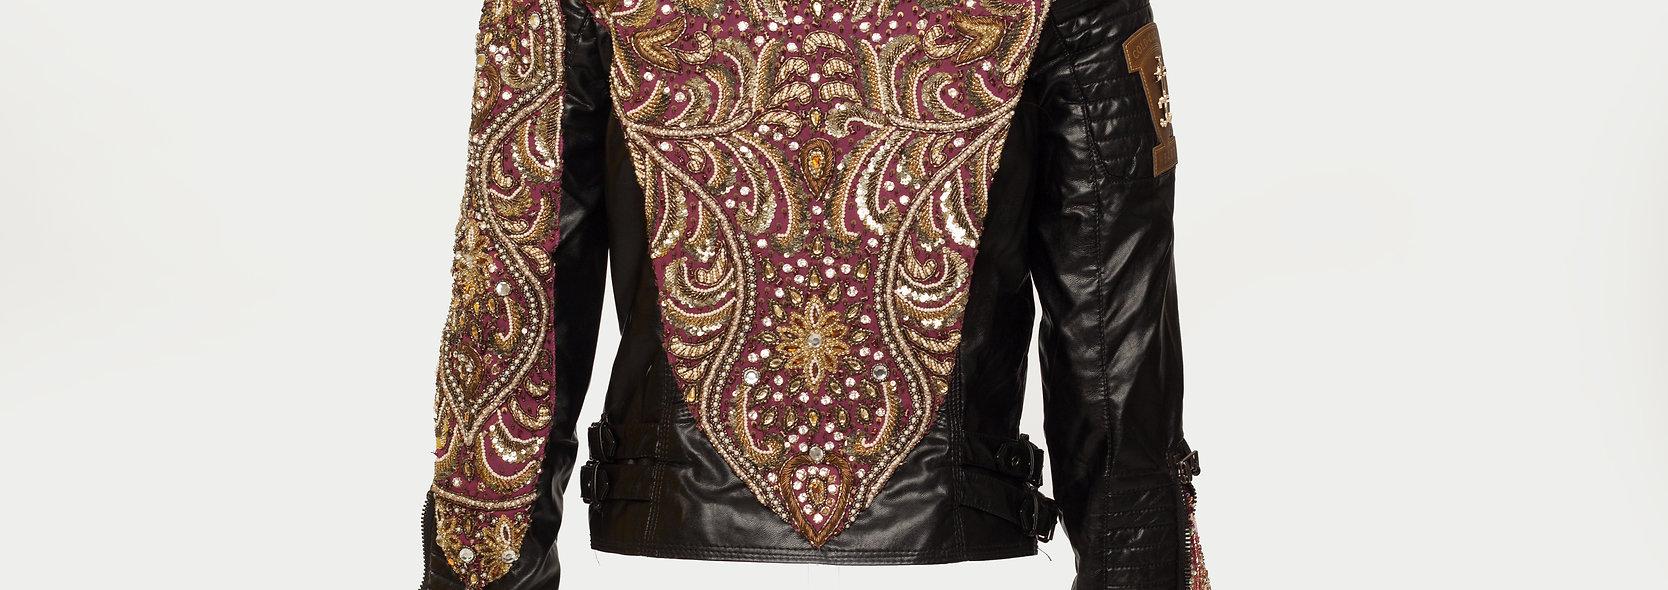 Bokeh Gipsy Rider Jacket (M)